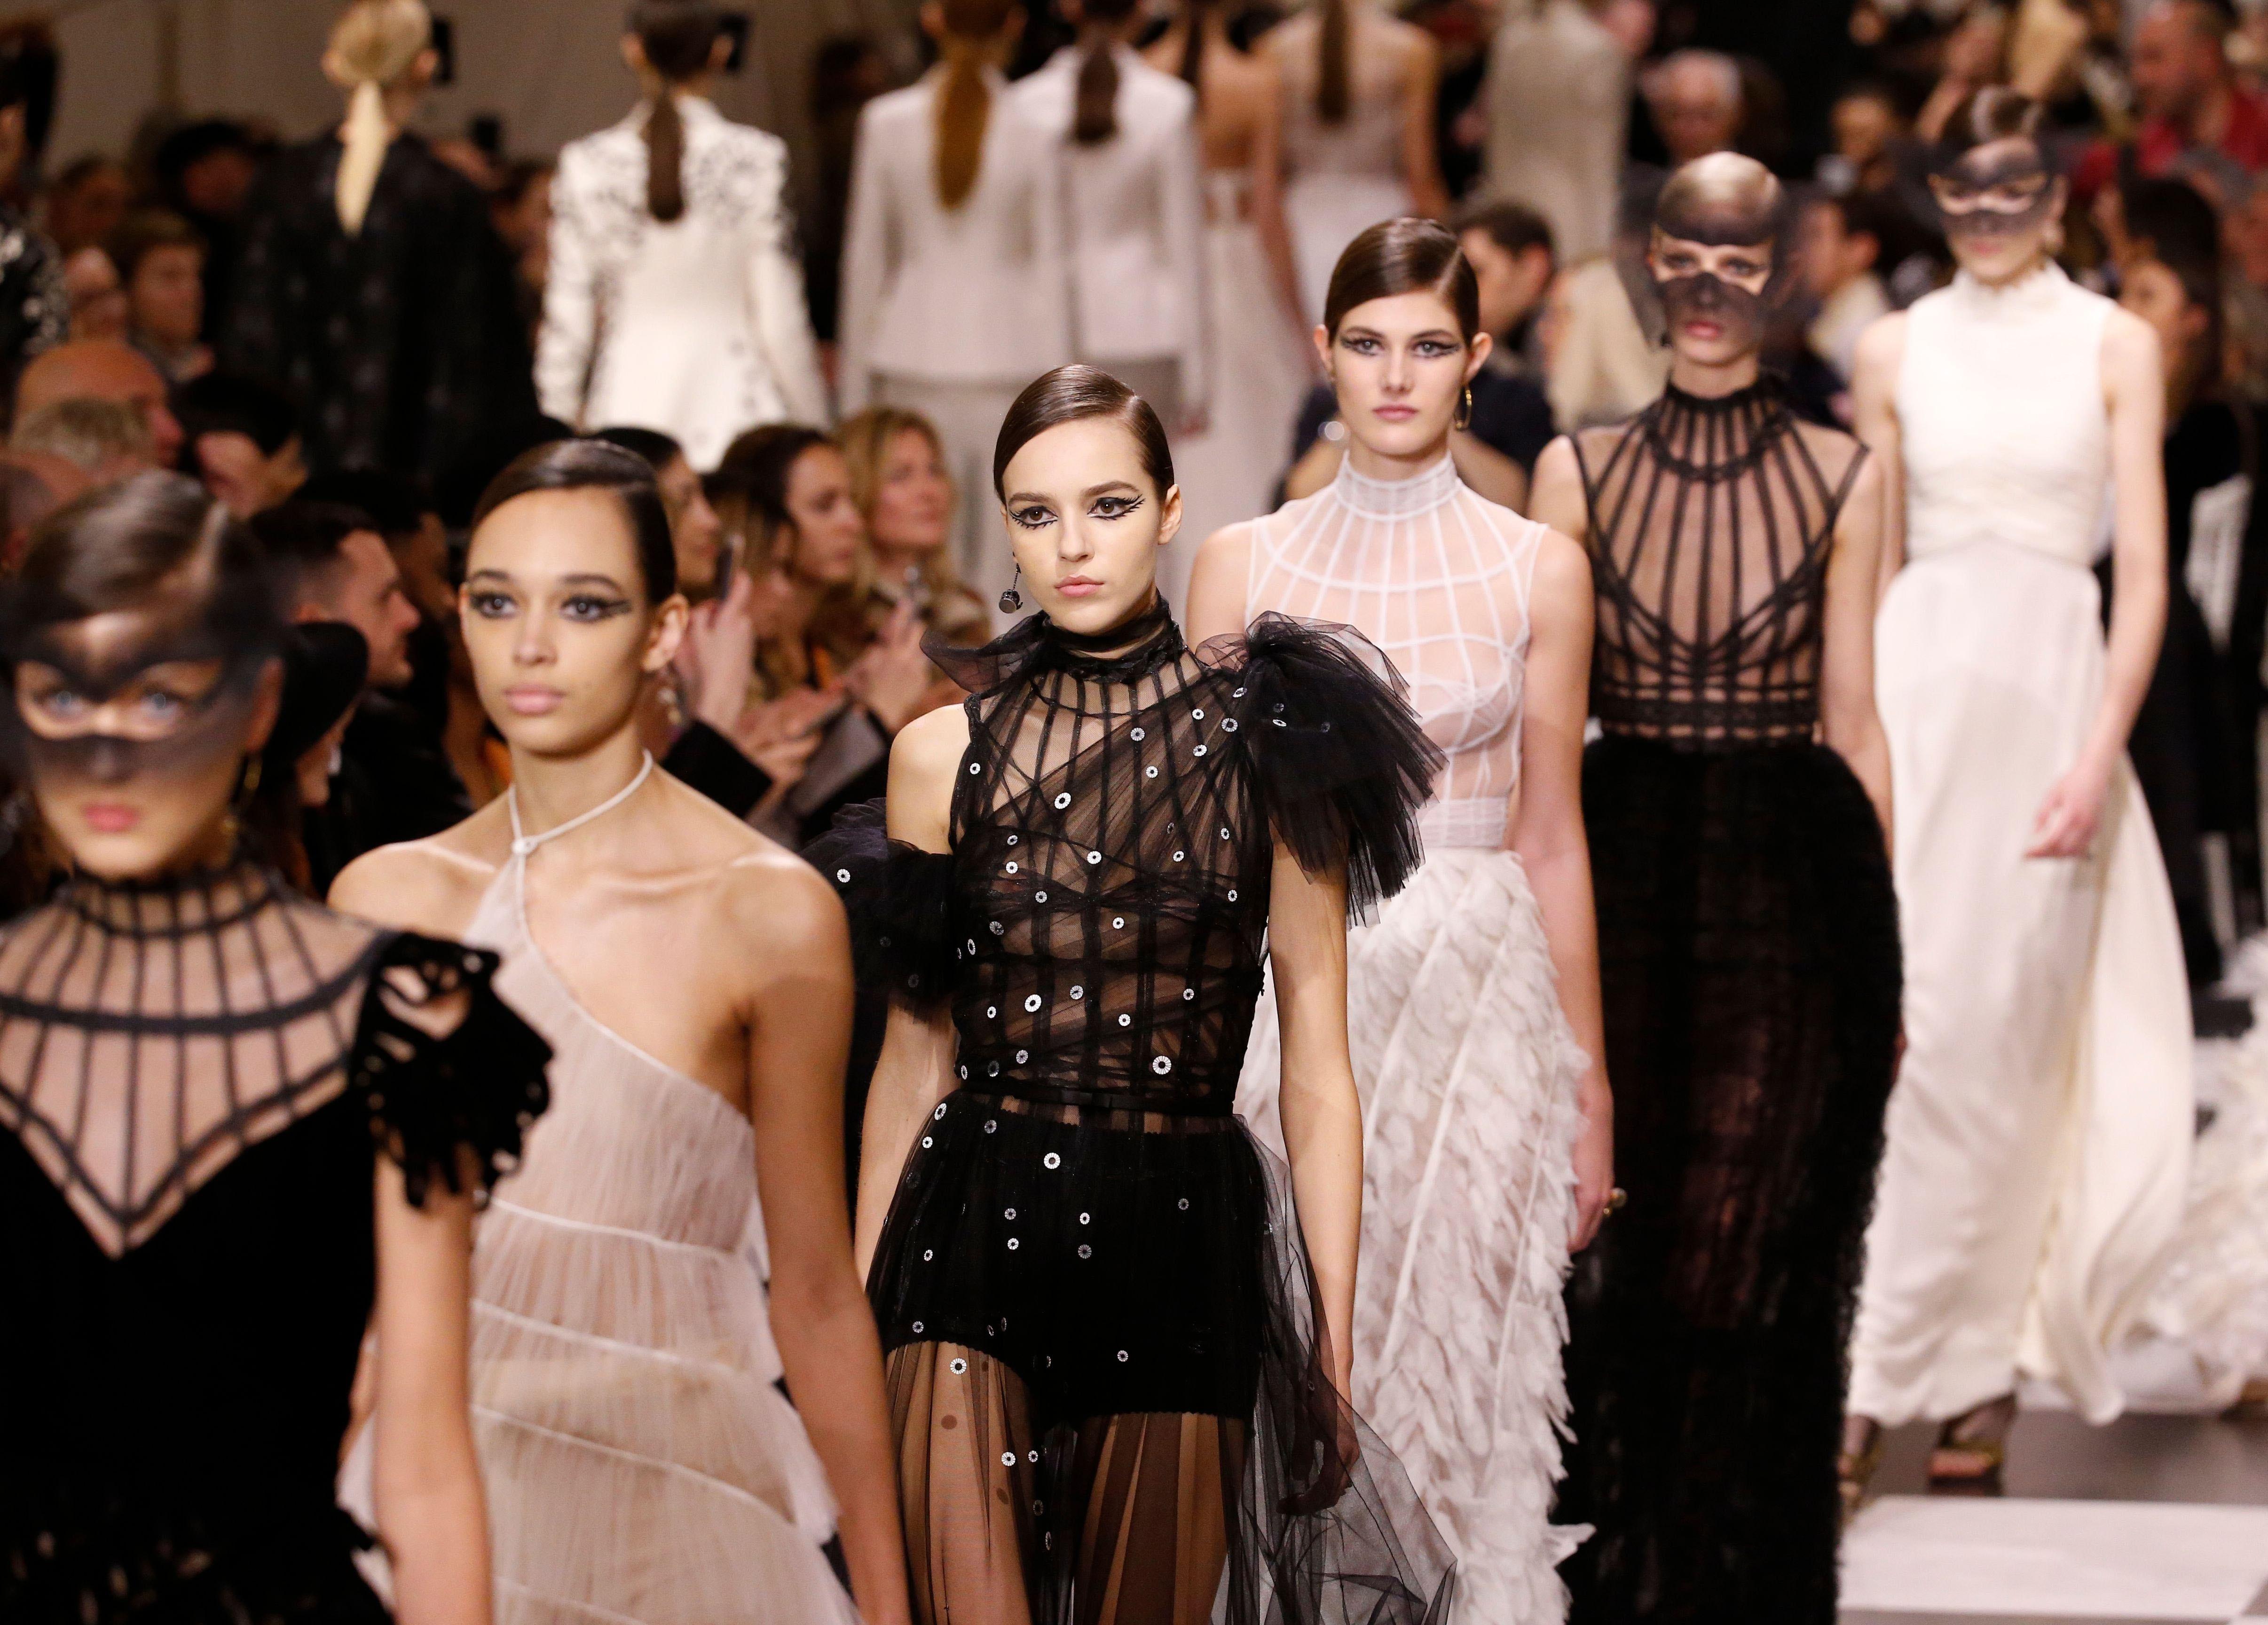 Christian Dior show, Runway, Spring Summer 2018, Haute Couture Fashion Week, Paris, France - 22 Jan 2018